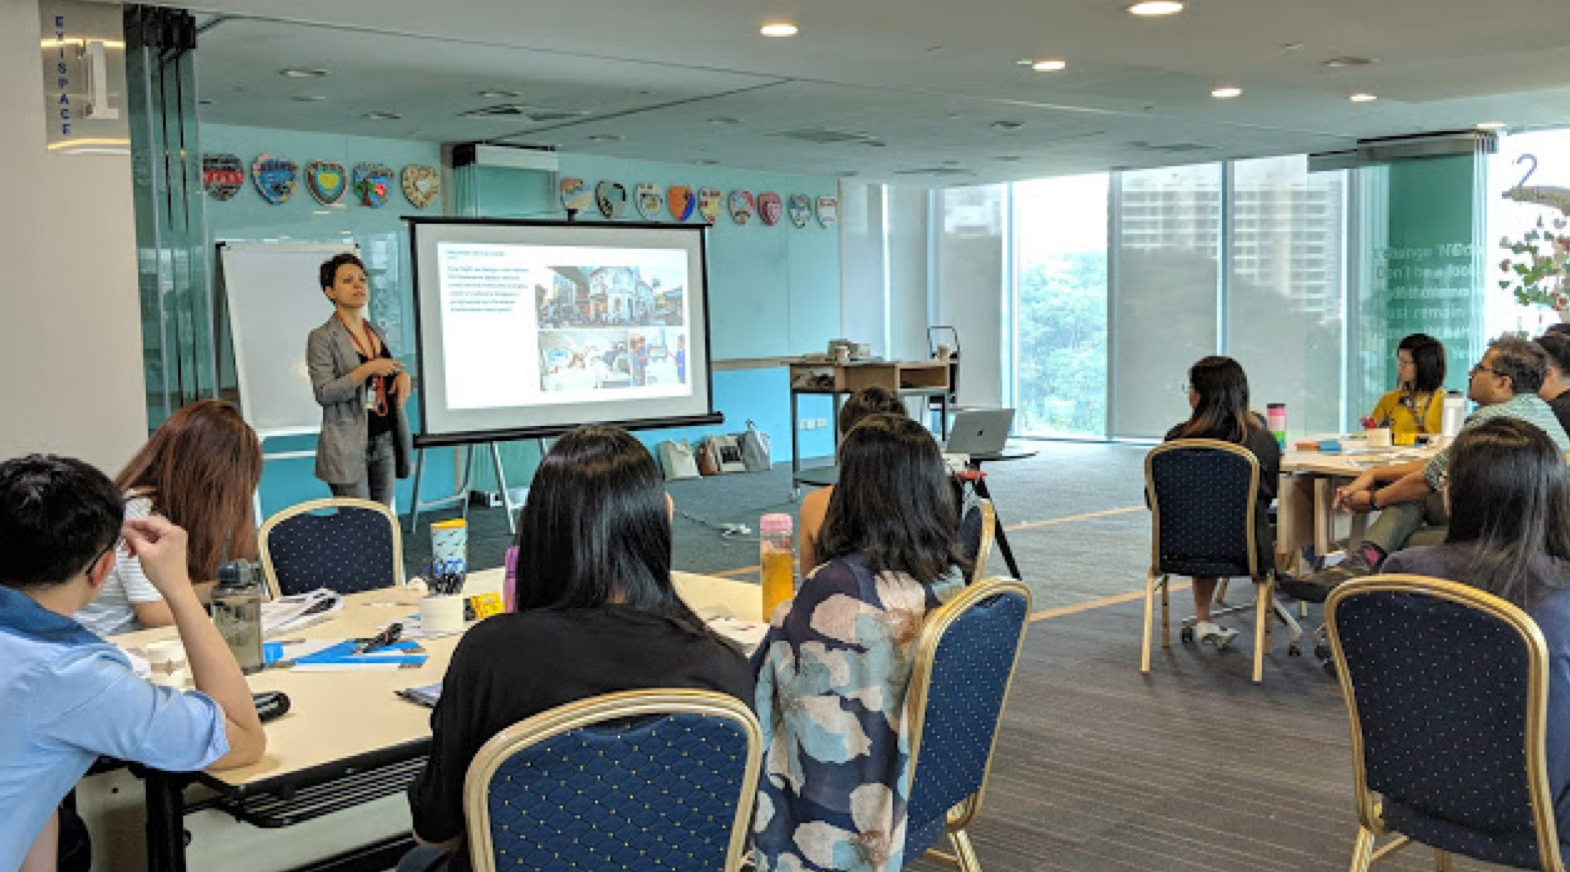 Karin teaches a course on design thinking